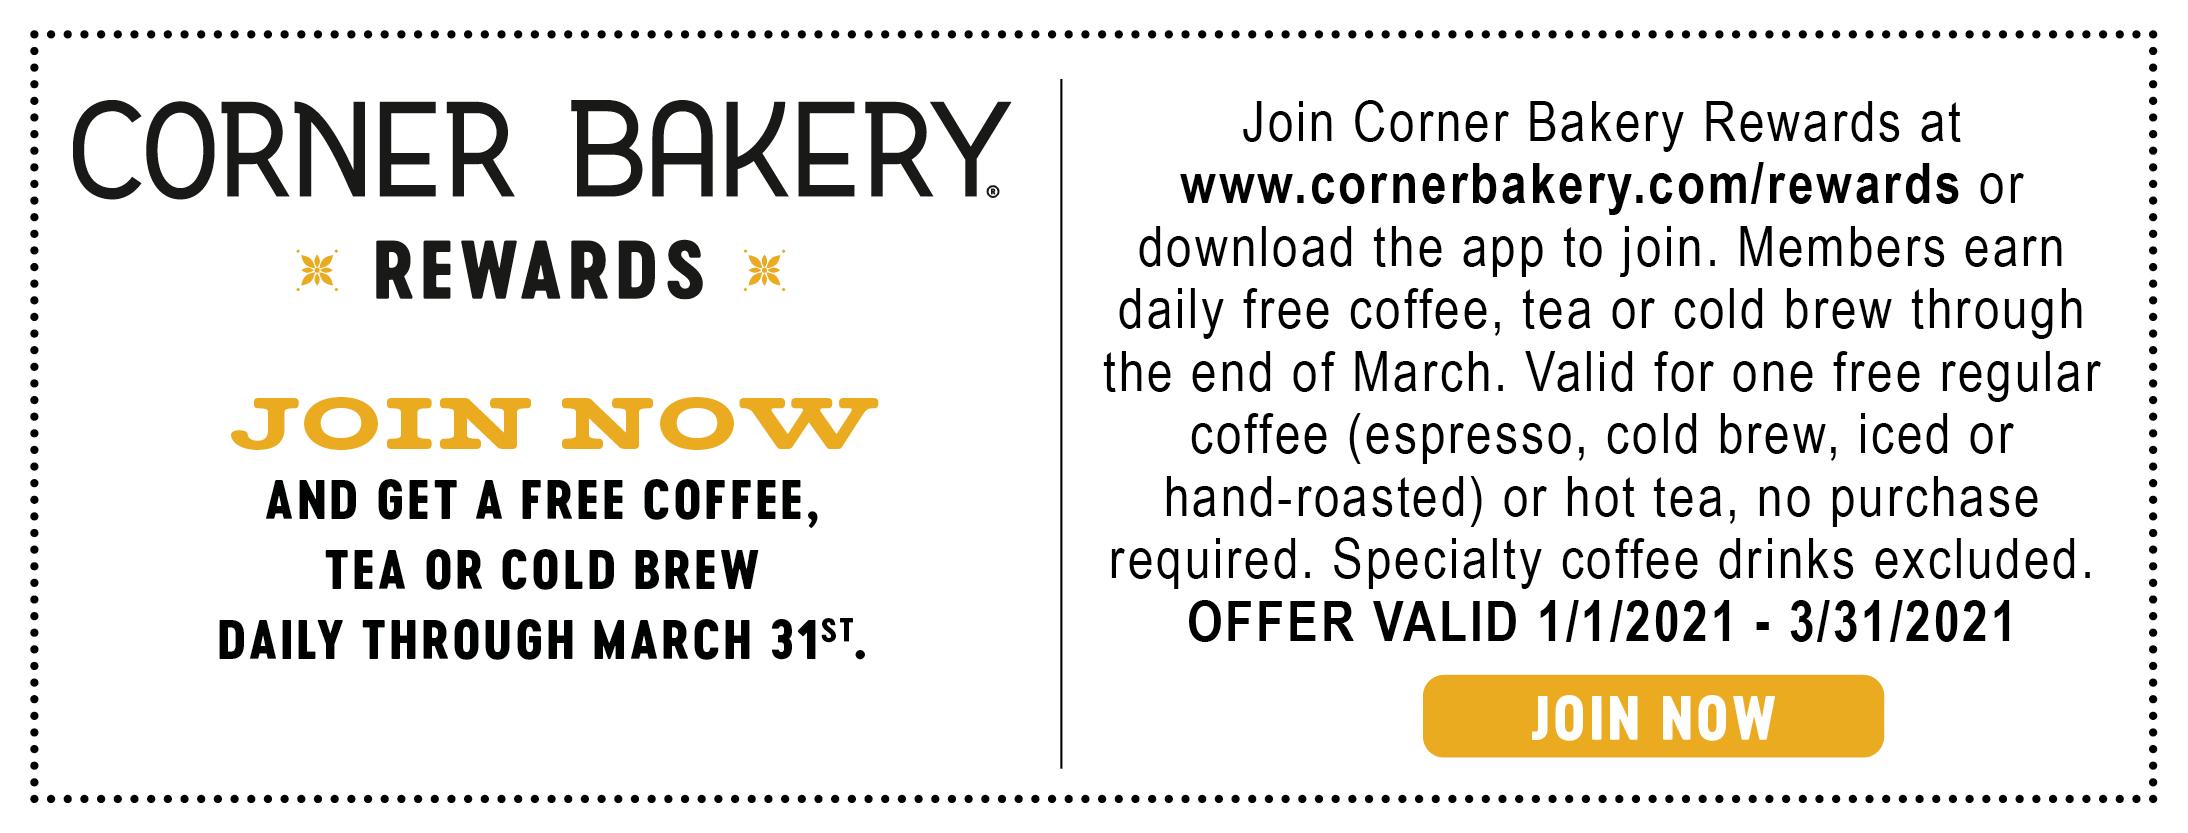 corner bakery cafe free coffee tea